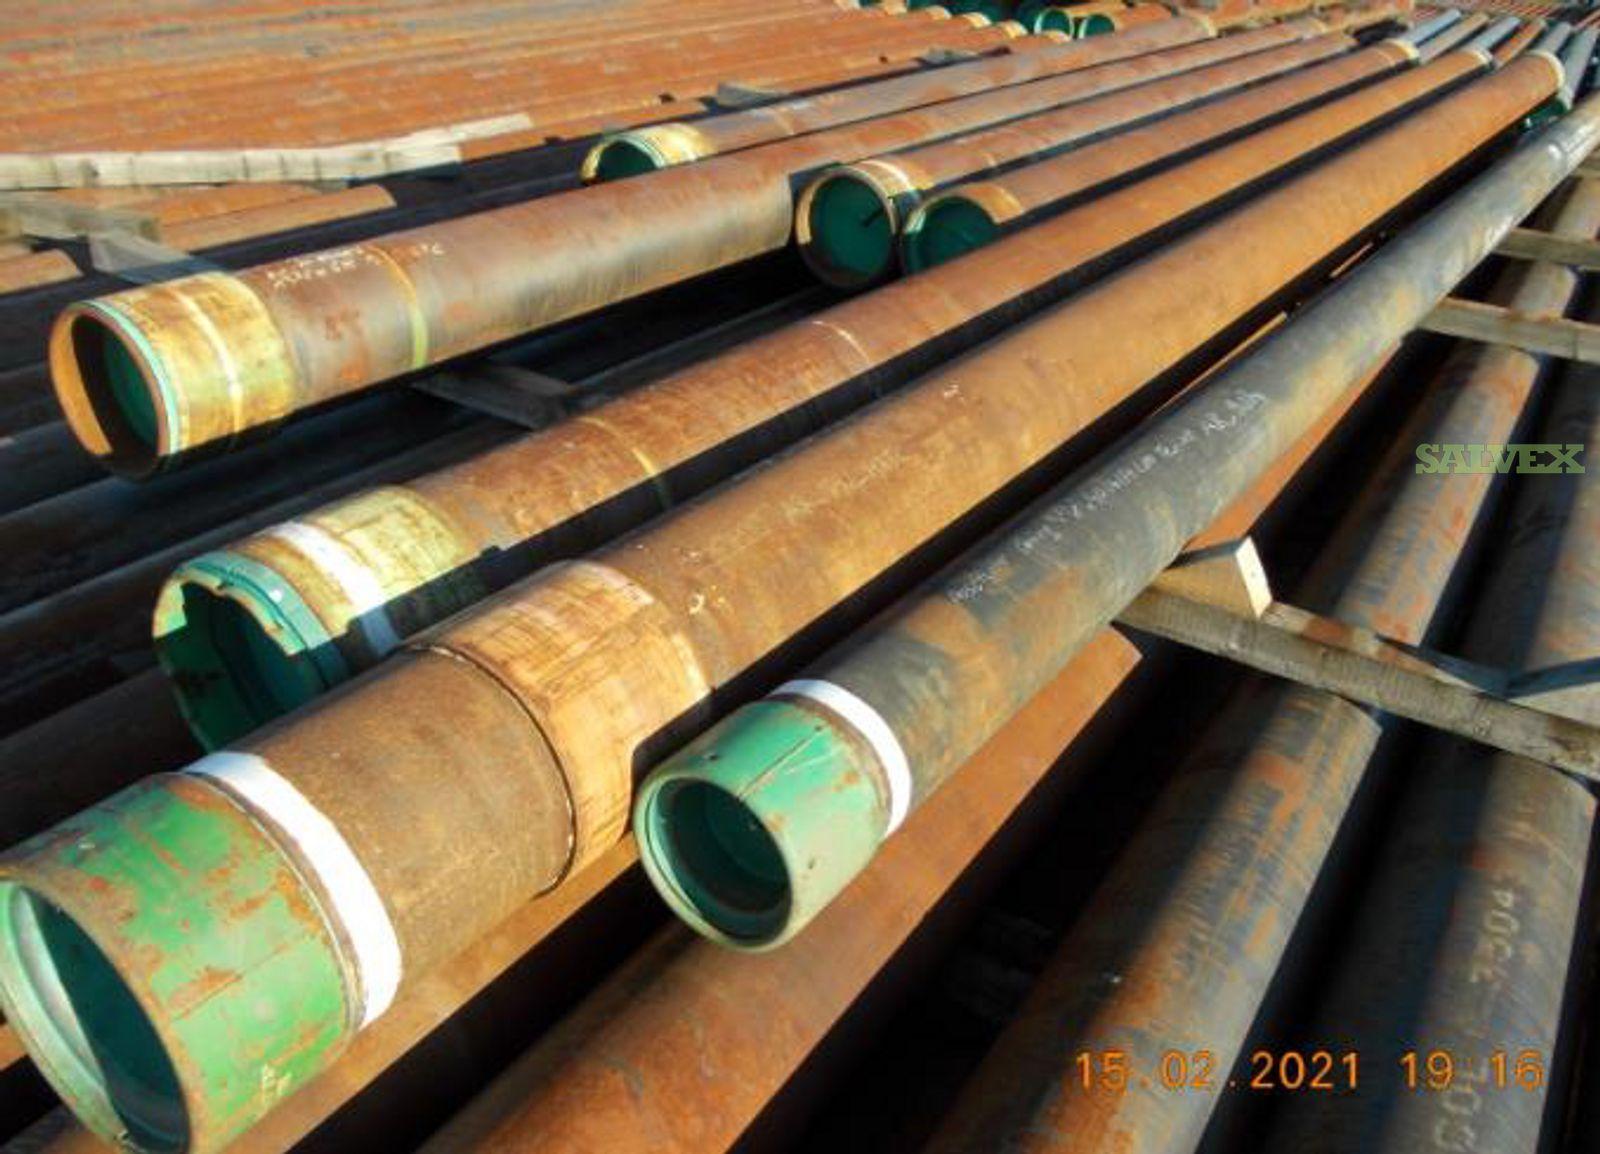 13 3/8 68# J55 BTC Surplus Casing (13,743 Feet / 424 Metric Tons)